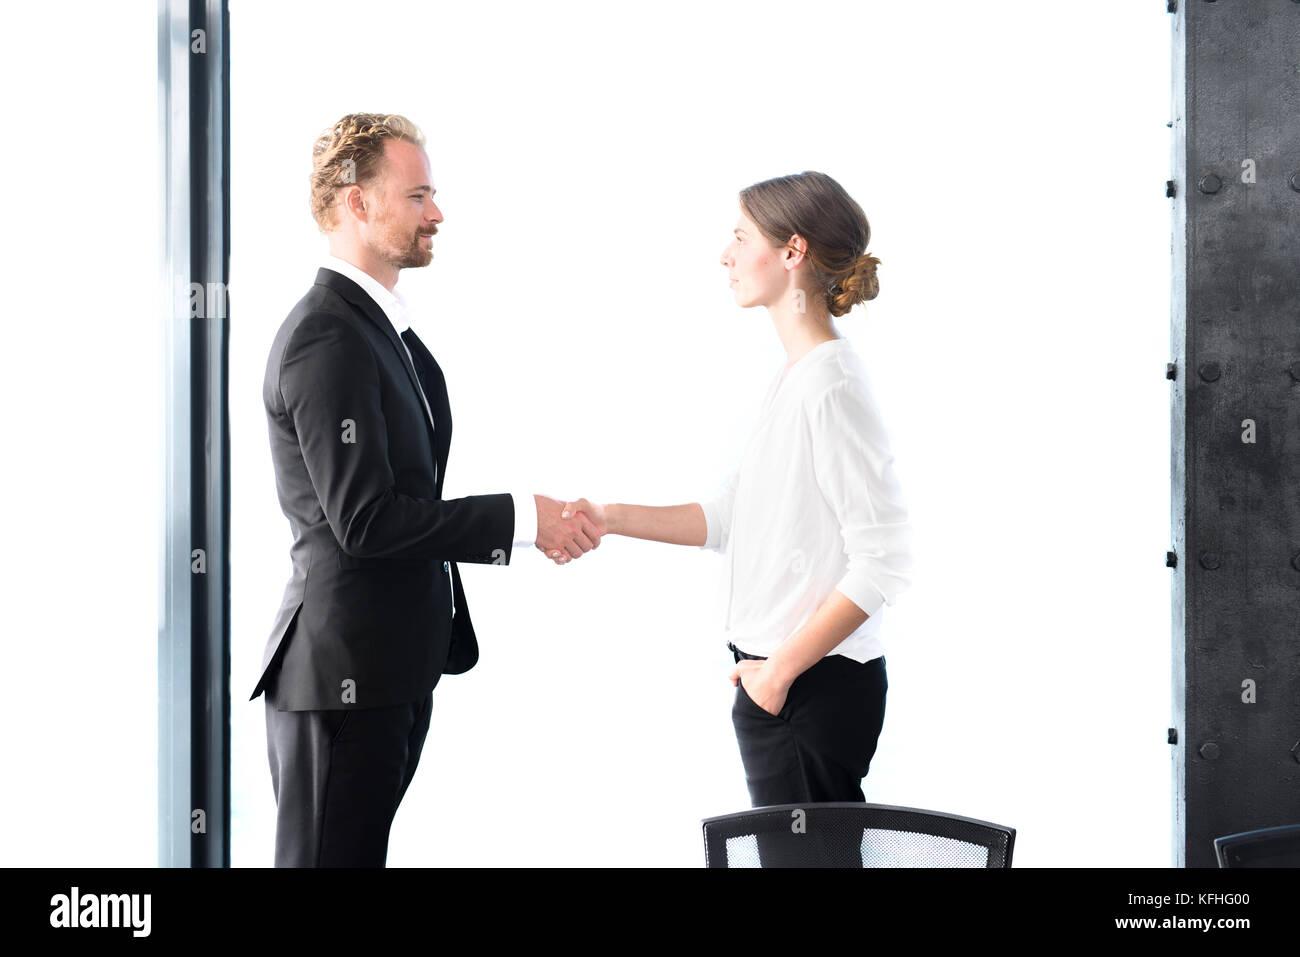 Business handshake. Concept of teamwork and partnership - Stock Image